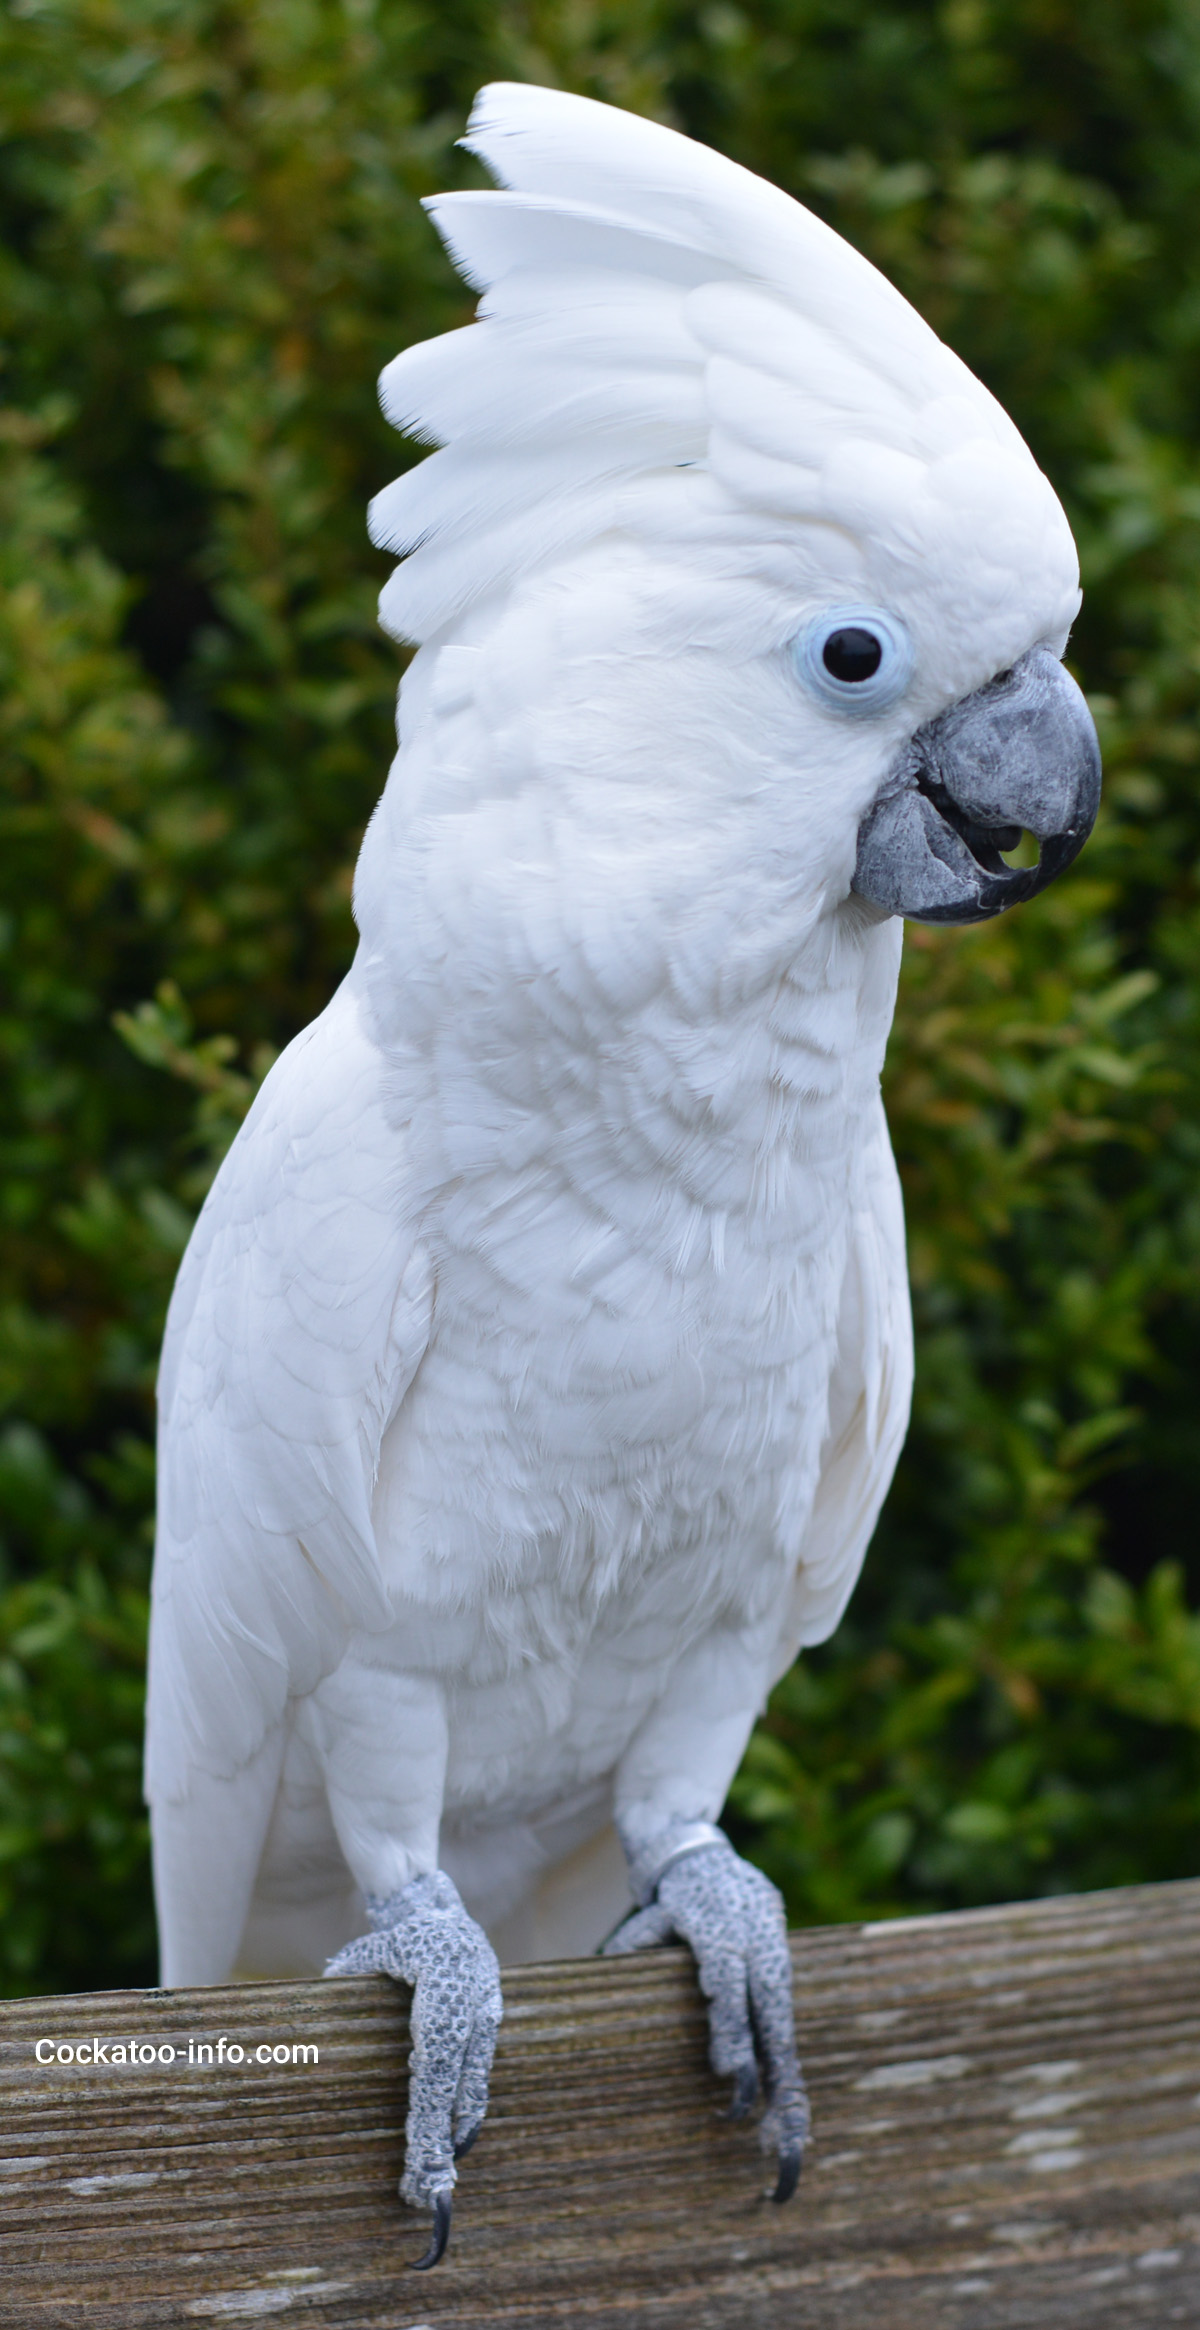 [Image: white-parrot-cockatoo-1.jpg]